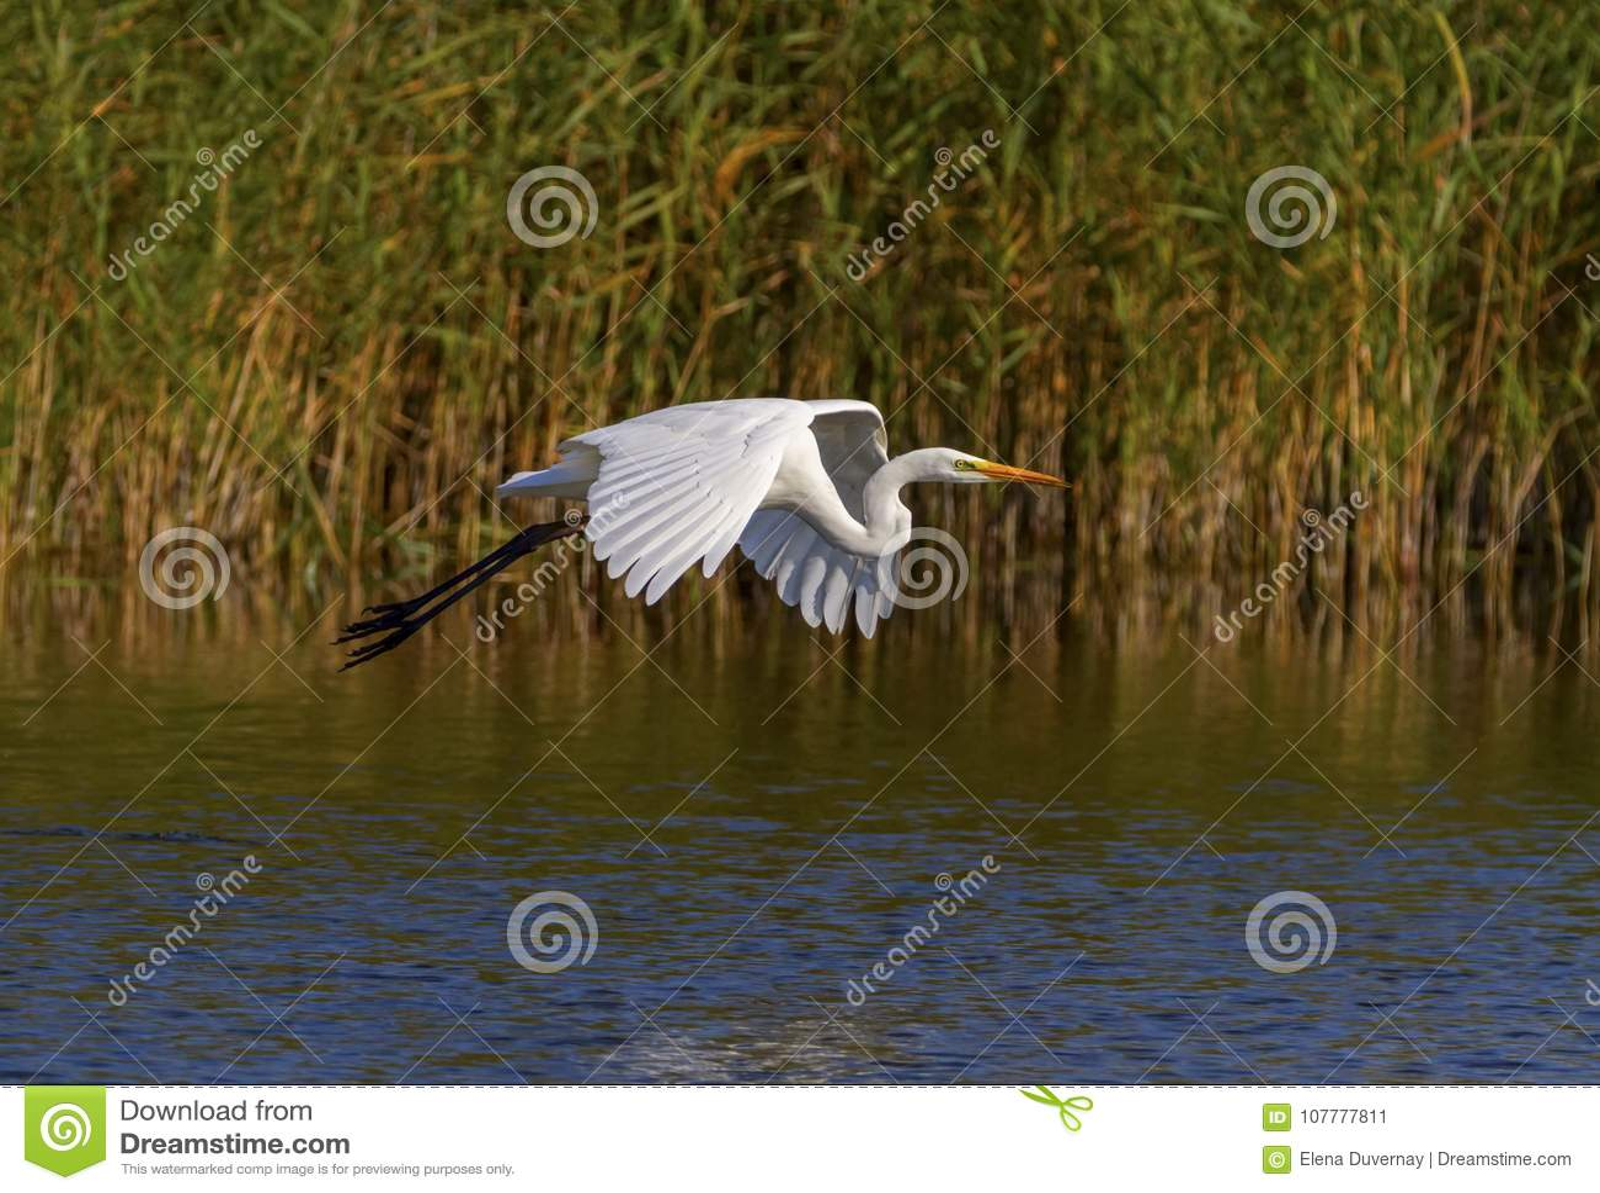 Great egret, ardea alba, flying, Neuchatel lake, Switzerland